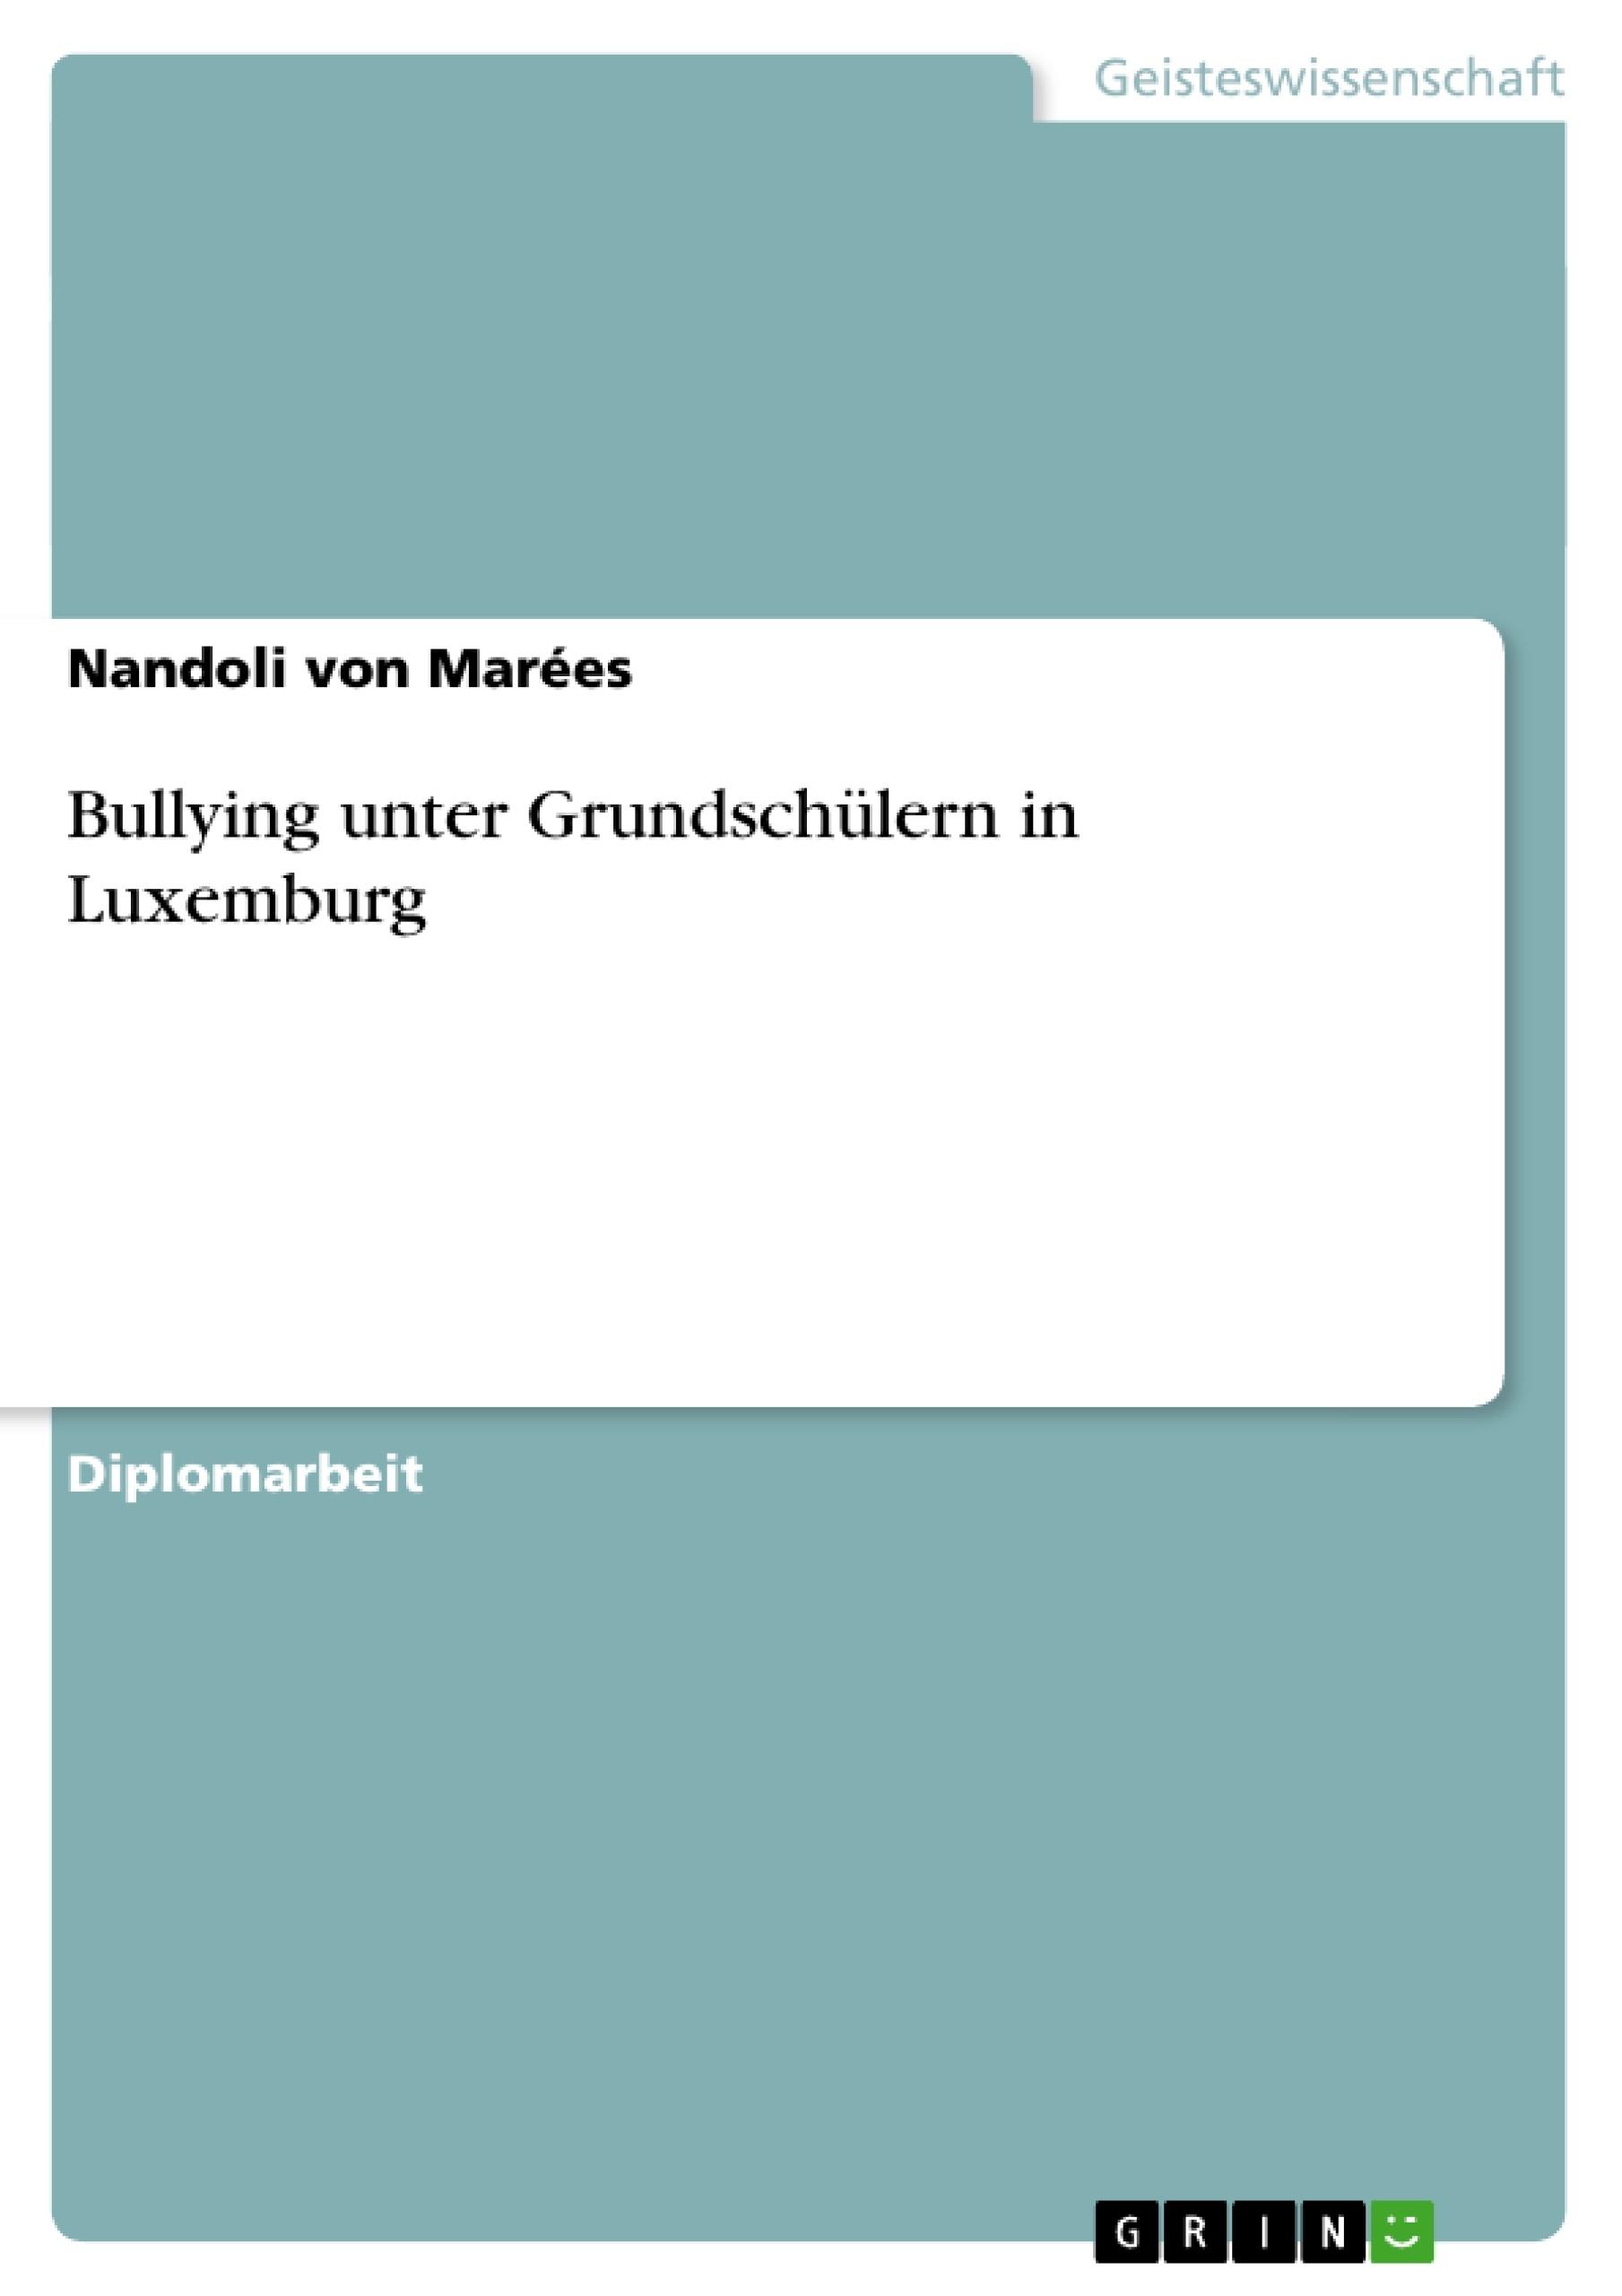 Titel: Bullying unter Grundschülern in Luxemburg